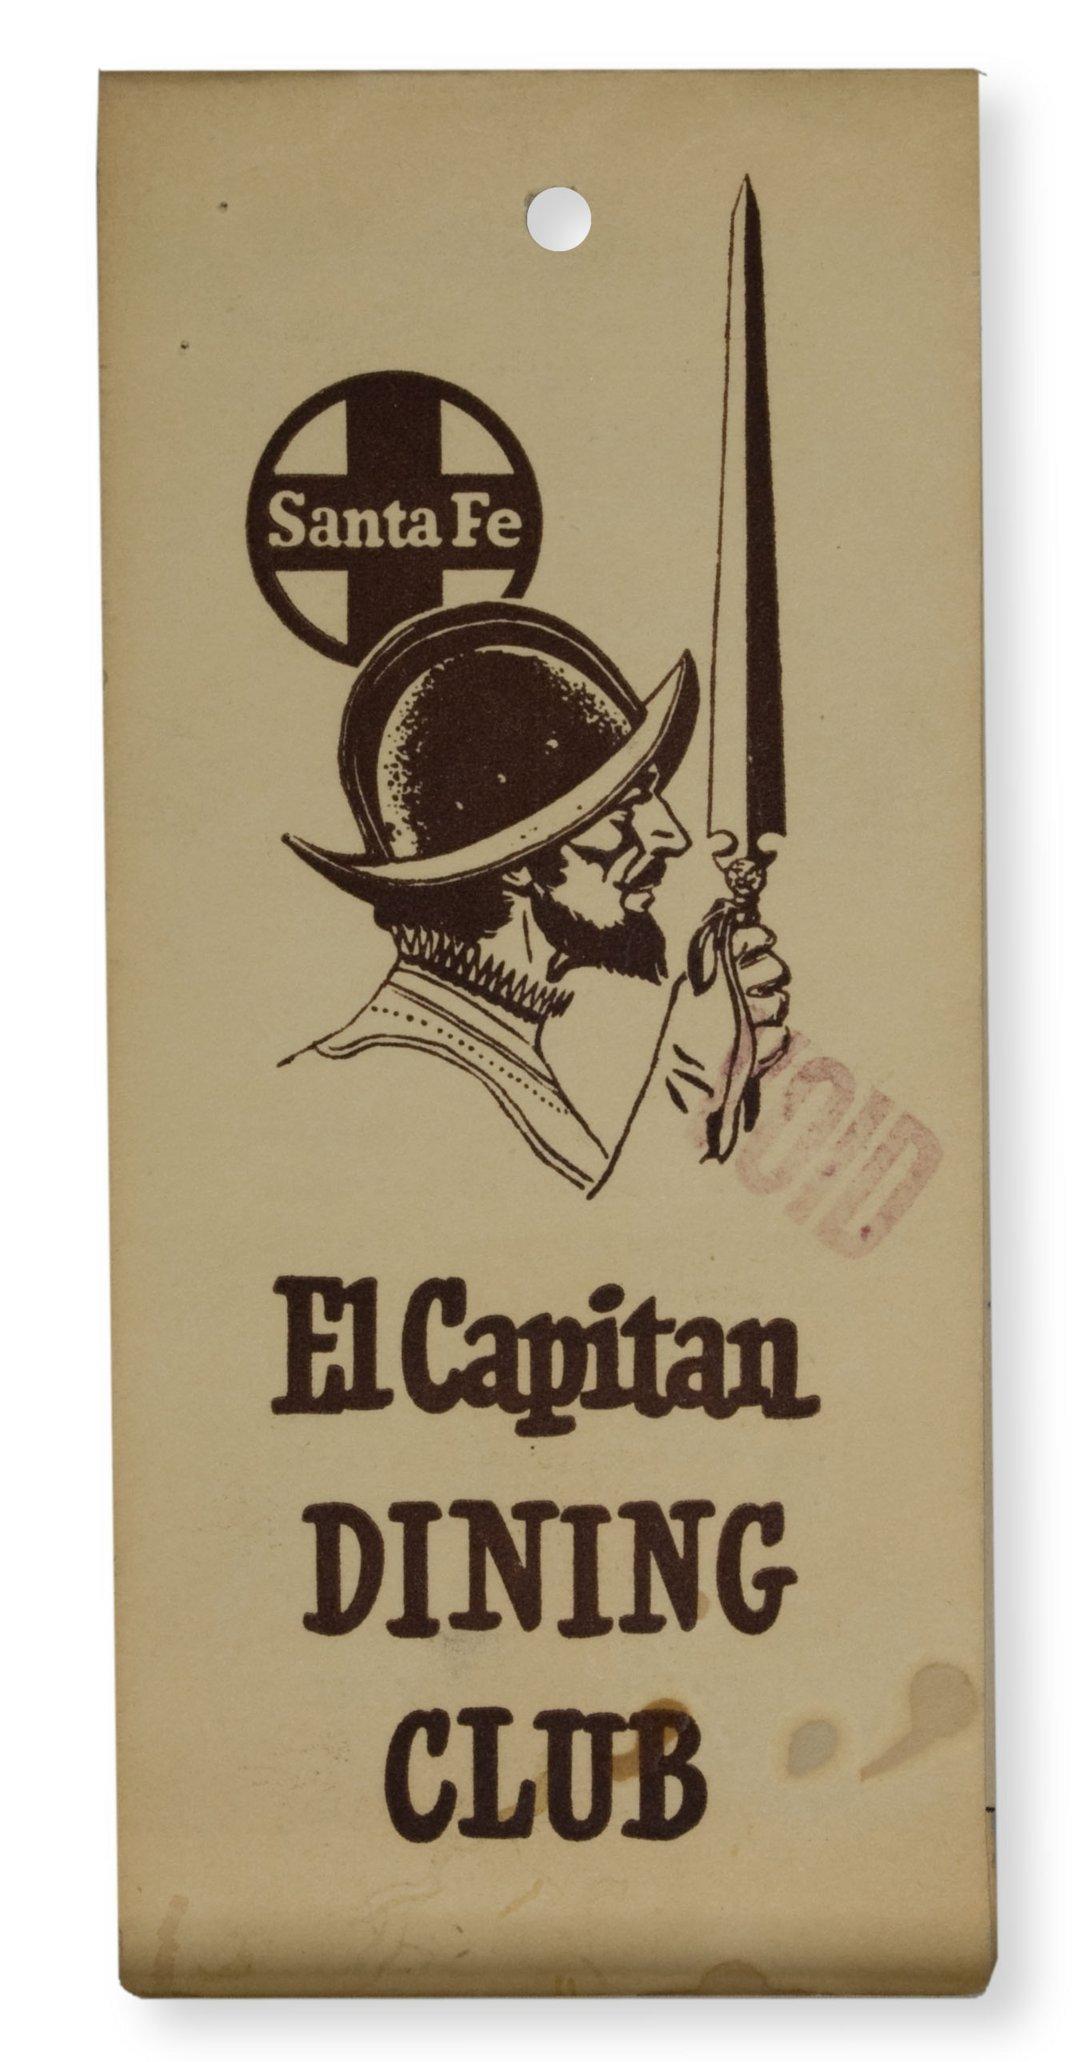 El Capitan Dining Club coupon booklet